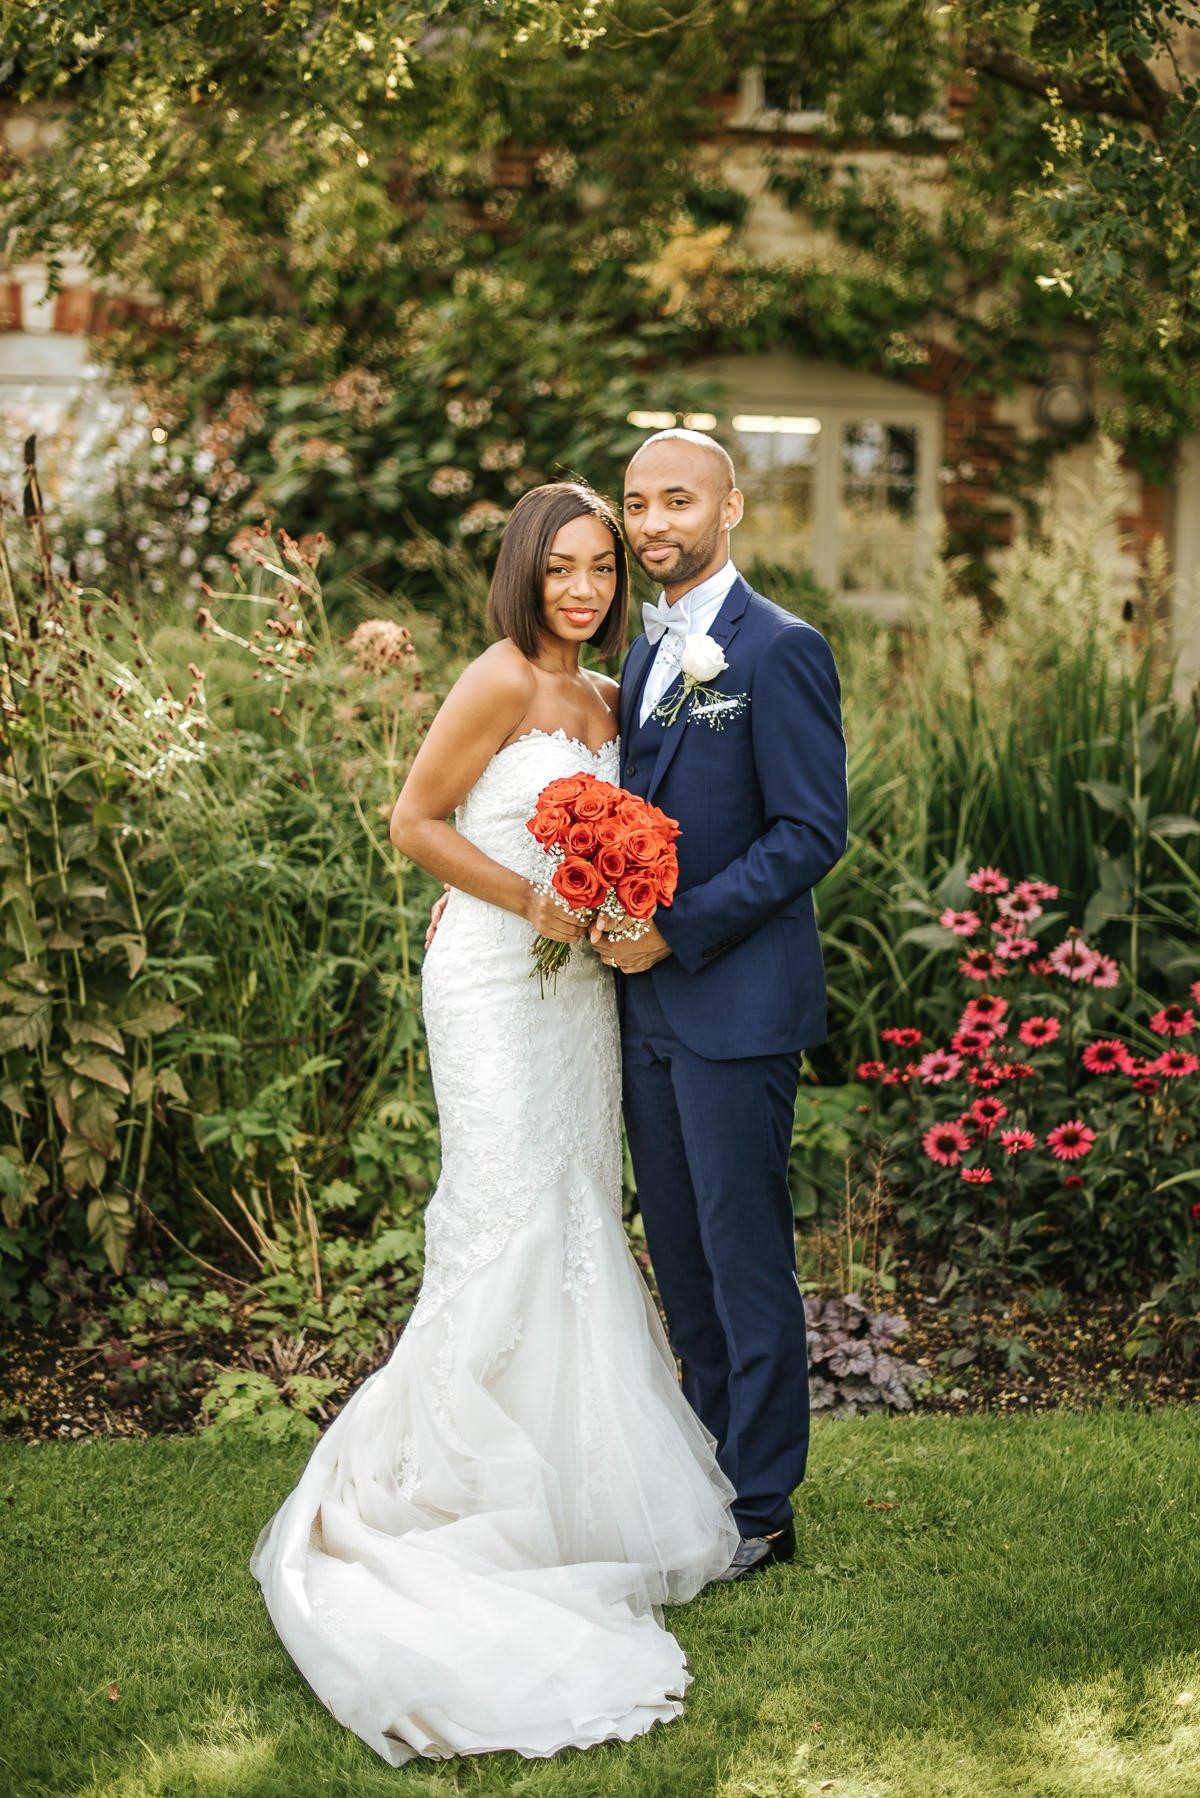 wedding-photographer-hampshire-58.2 56